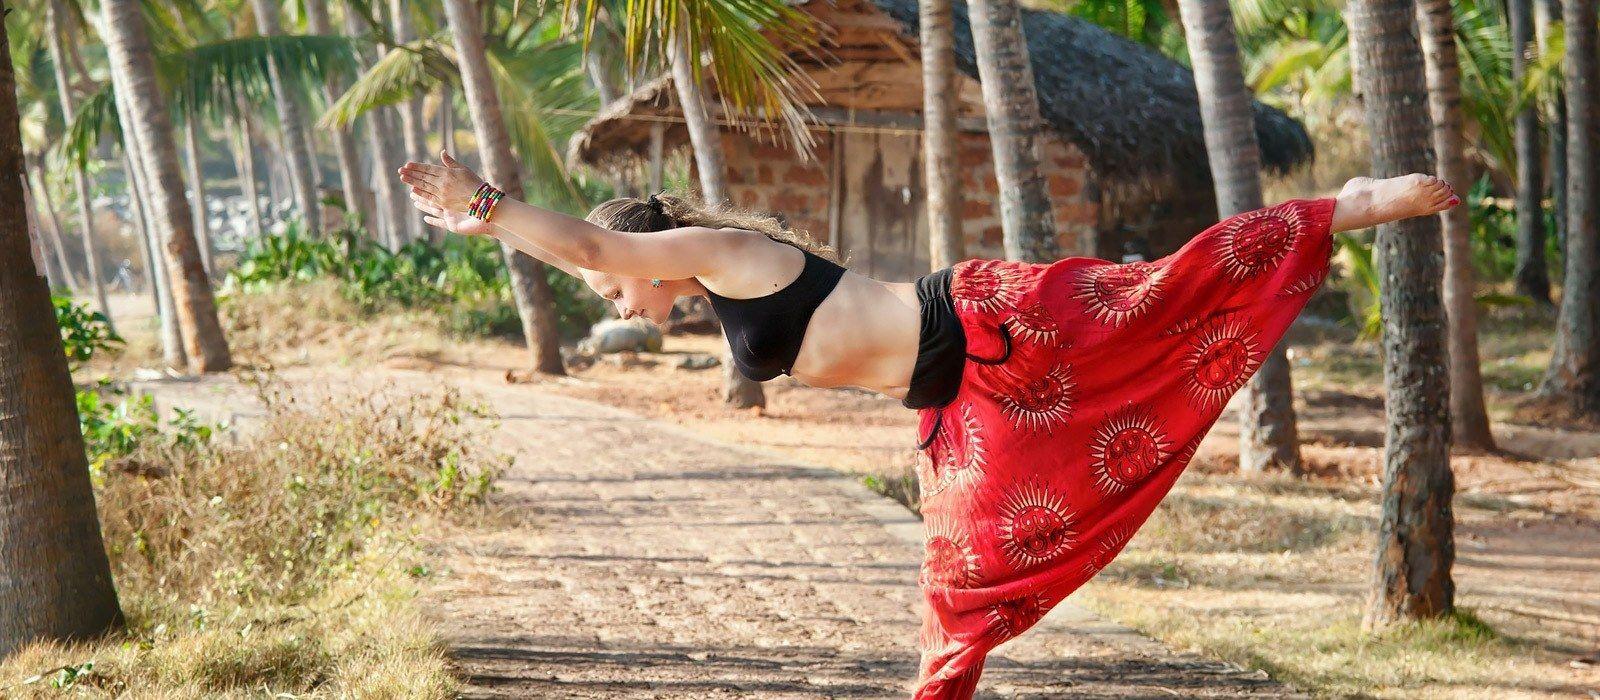 Spiritual and Symbolic India Tour Trip 4